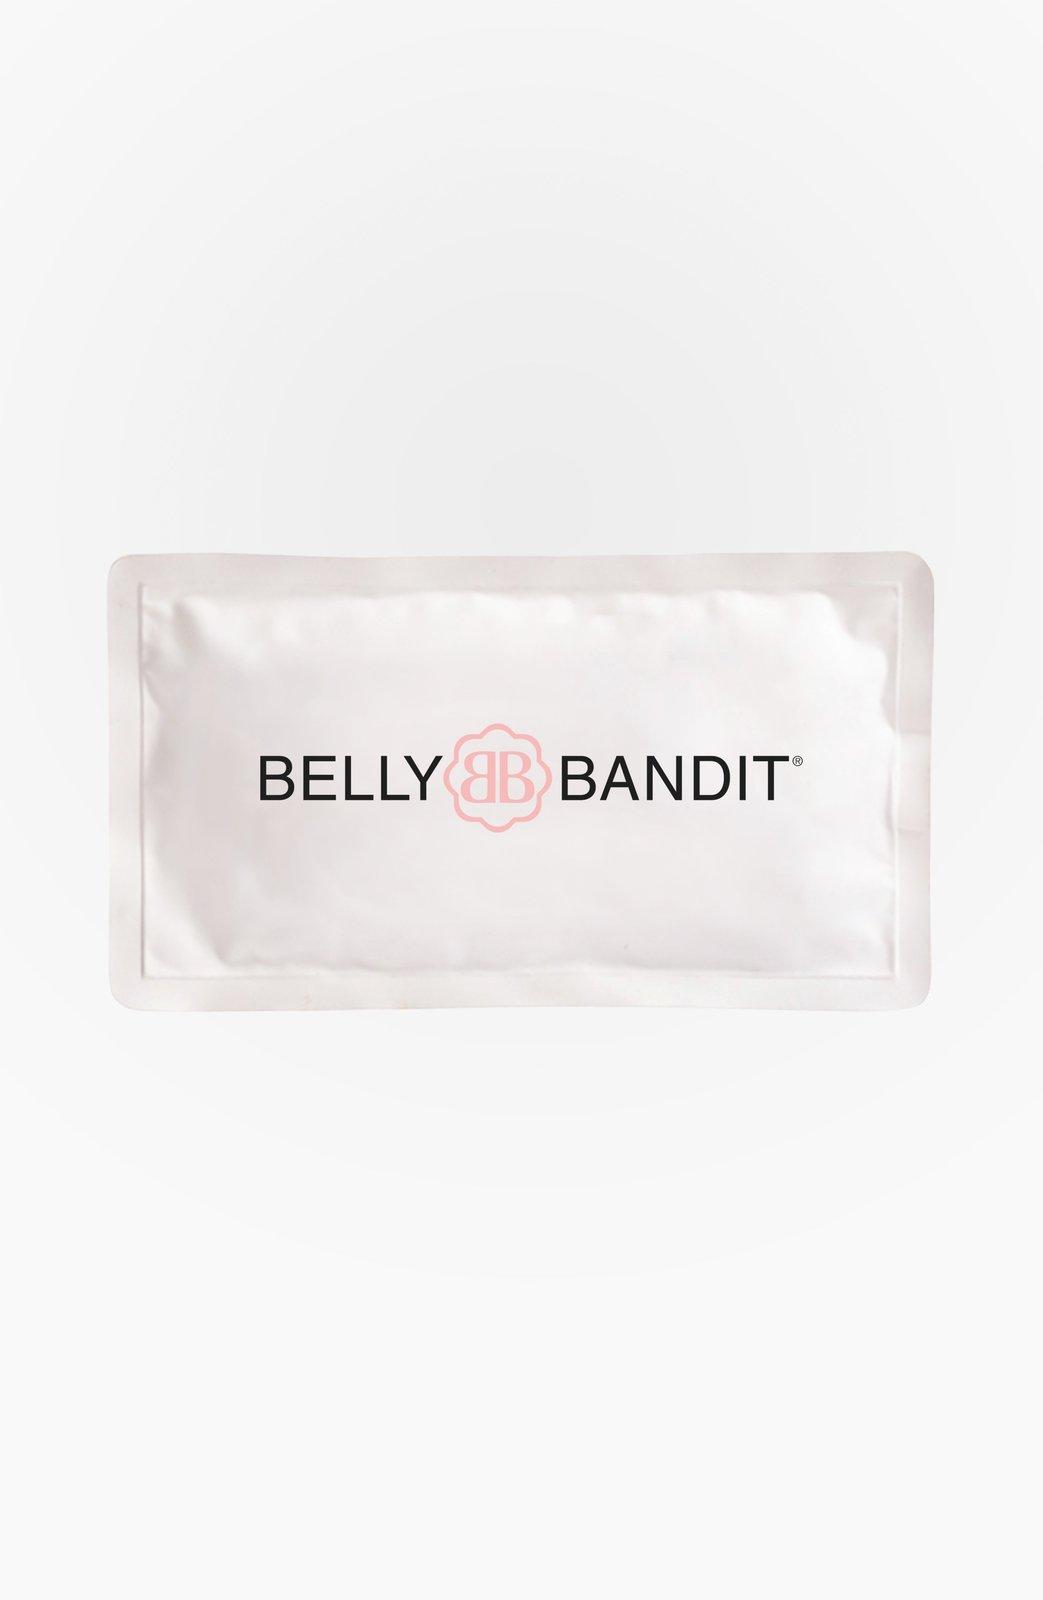 Belly Bandit: Upsie Belly - Black (Medium) image